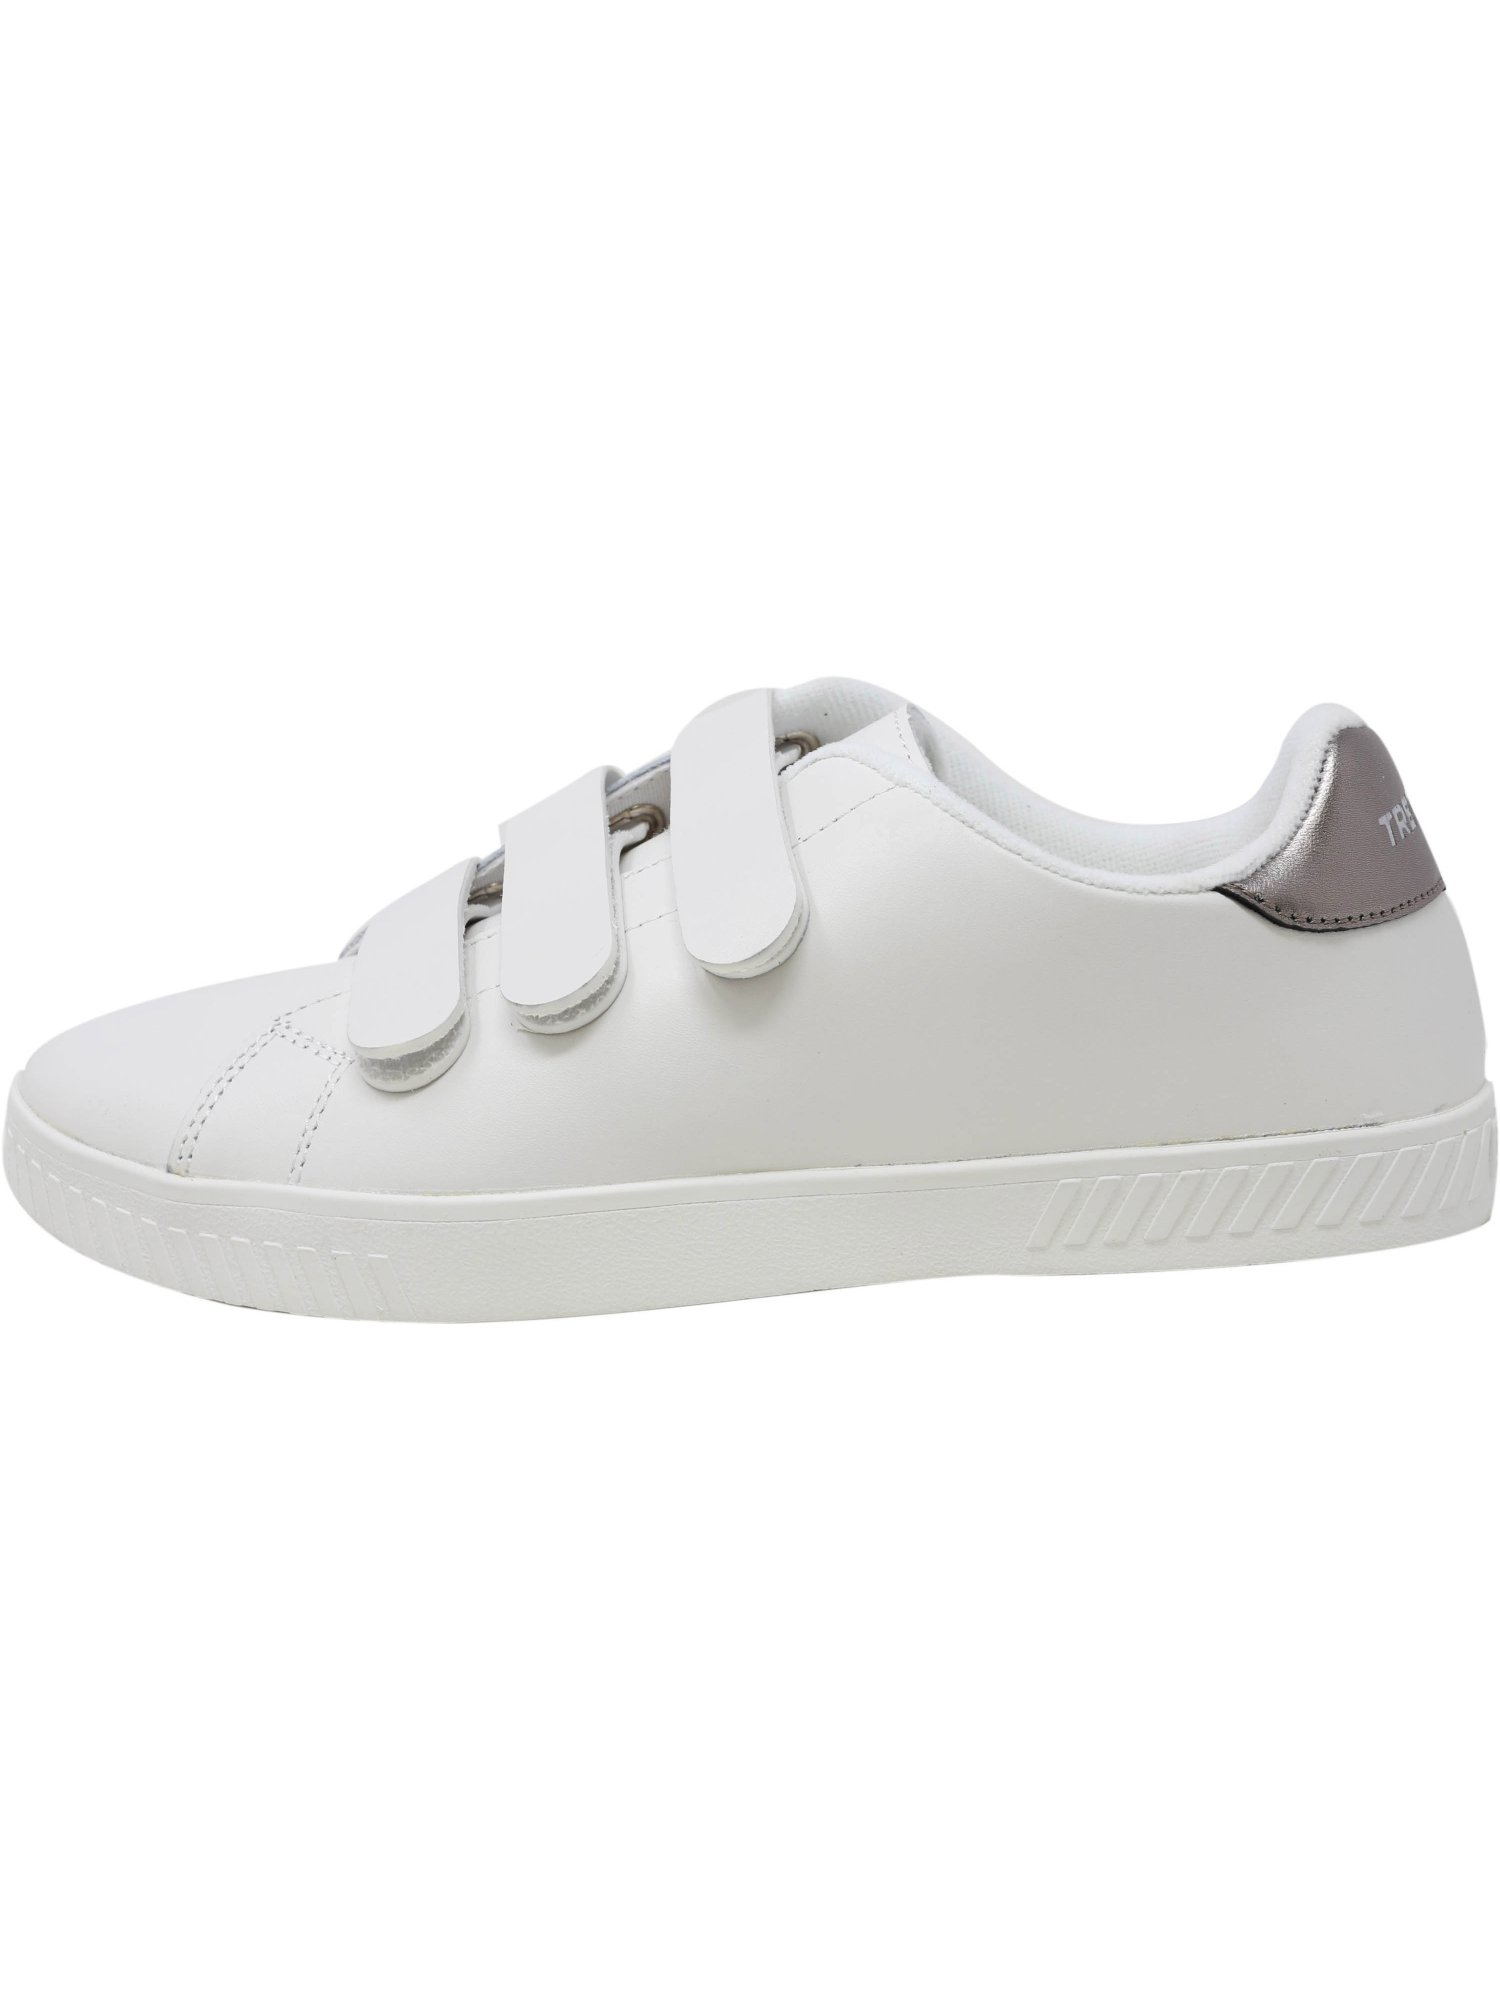 Homme-Tretorn-Transporter-2-en-Cuir-Cheville-High-Fashion-Sneaker miniature 11